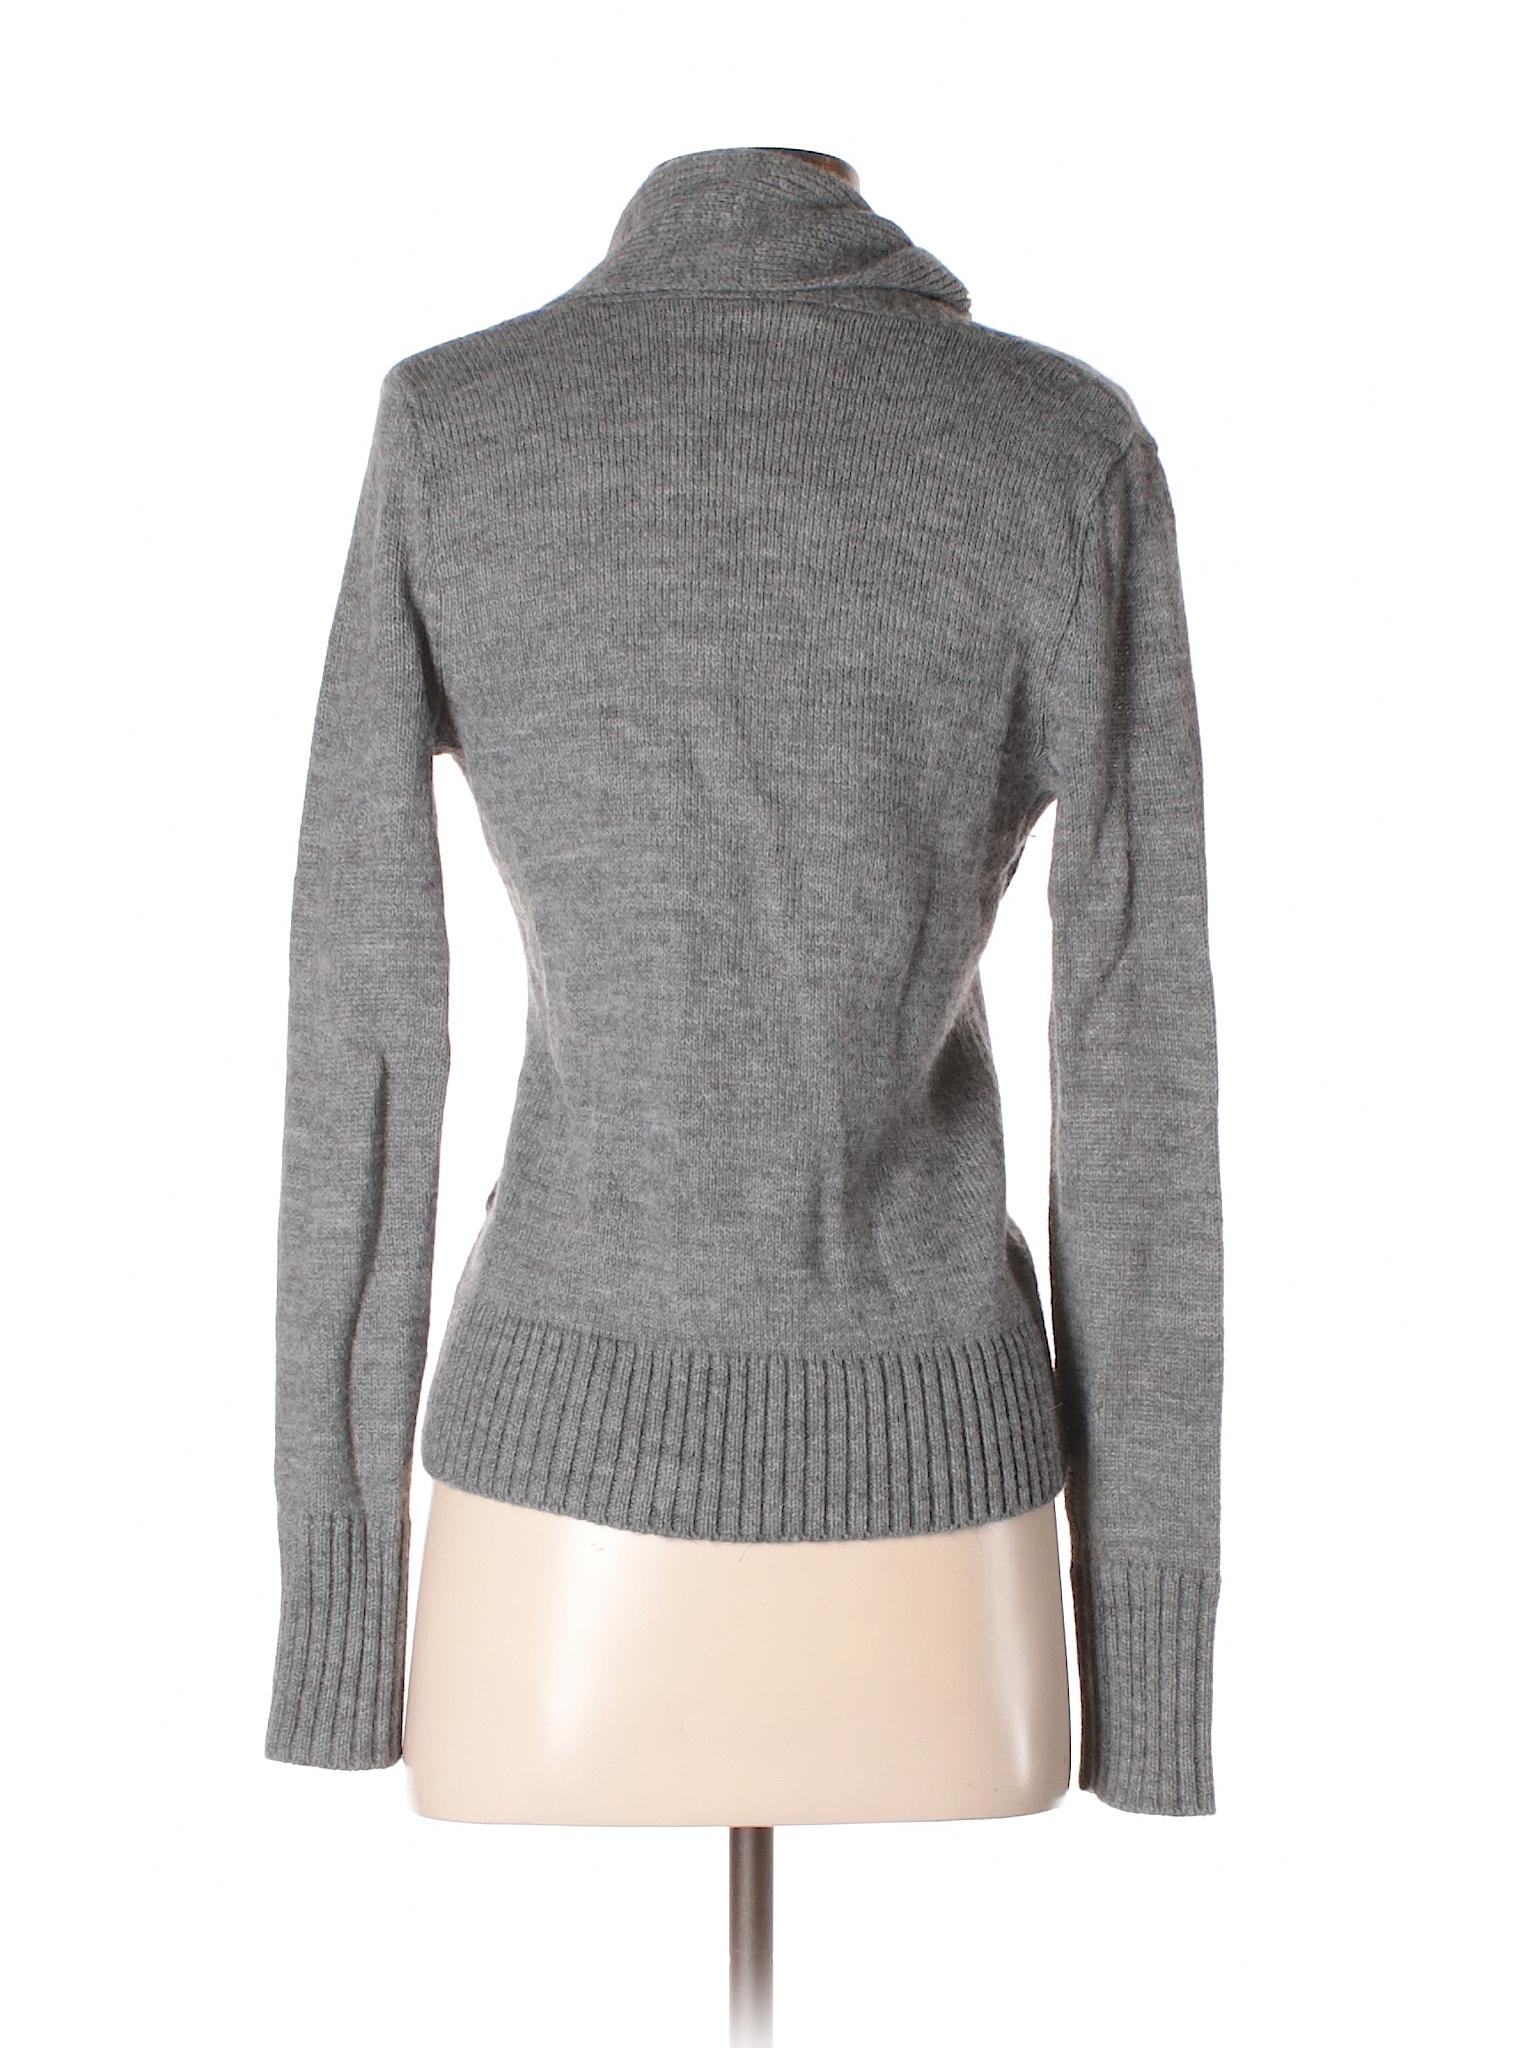 Boutique Pullover Sweater winter J Crew rUrz4